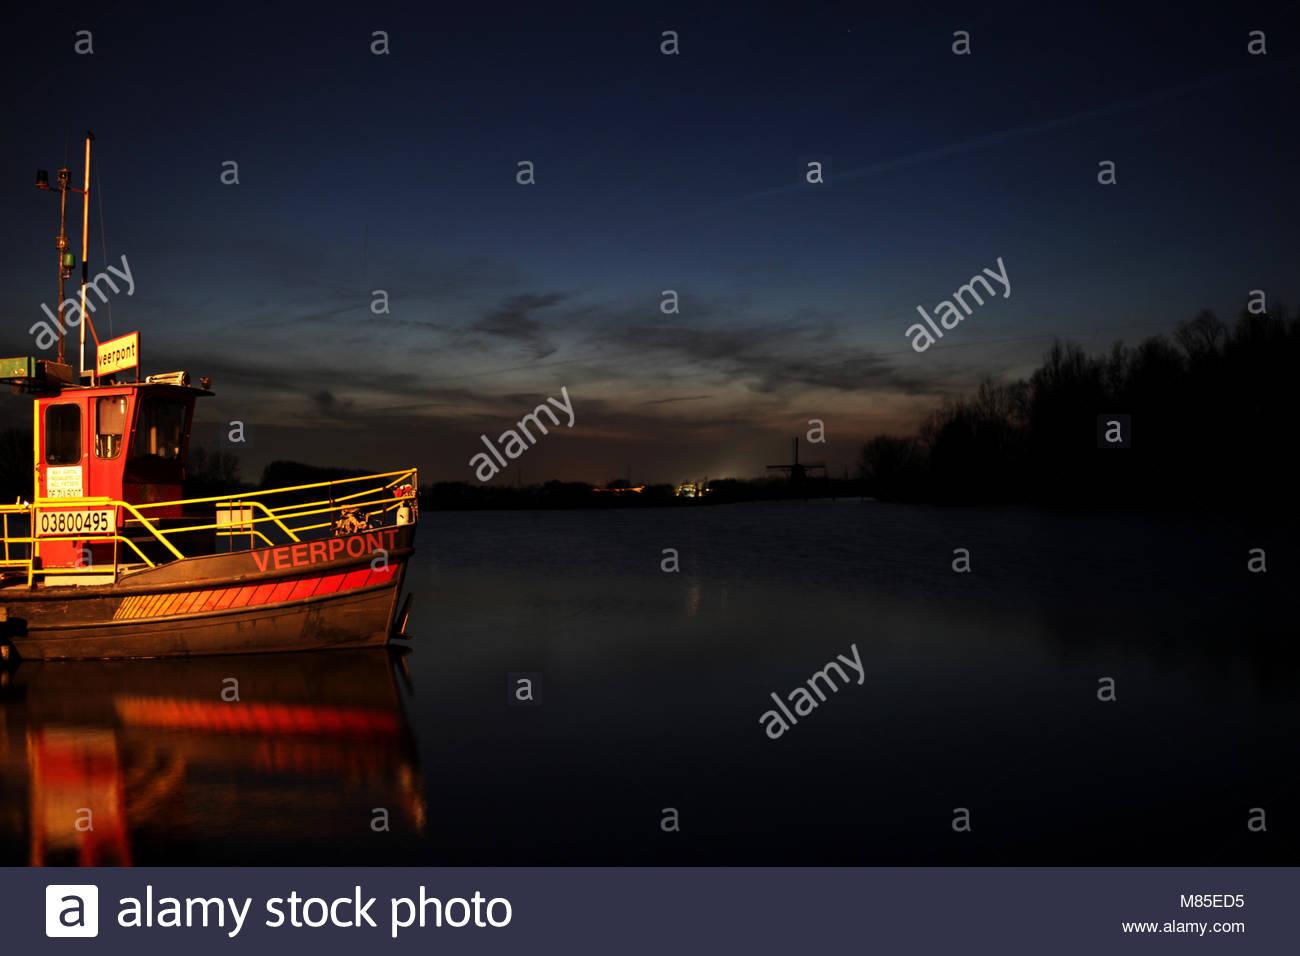 Ferryboat in the evening near Leiden, Netherlands - Stock Image